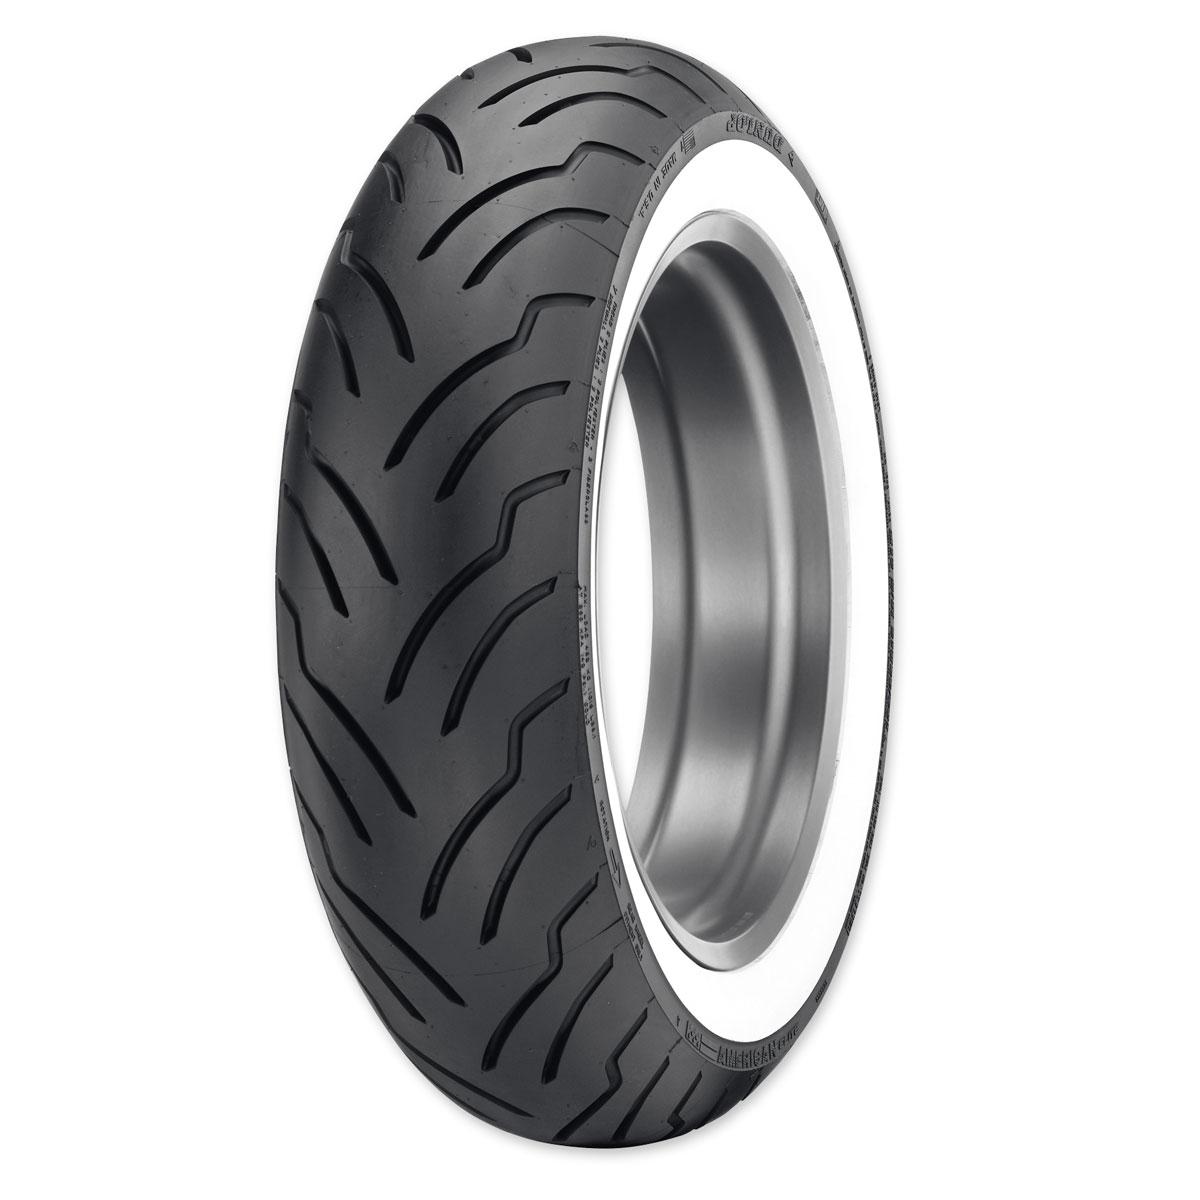 Dunlop American Elite MT90B16 74H Wide Whitewall Rear Tire